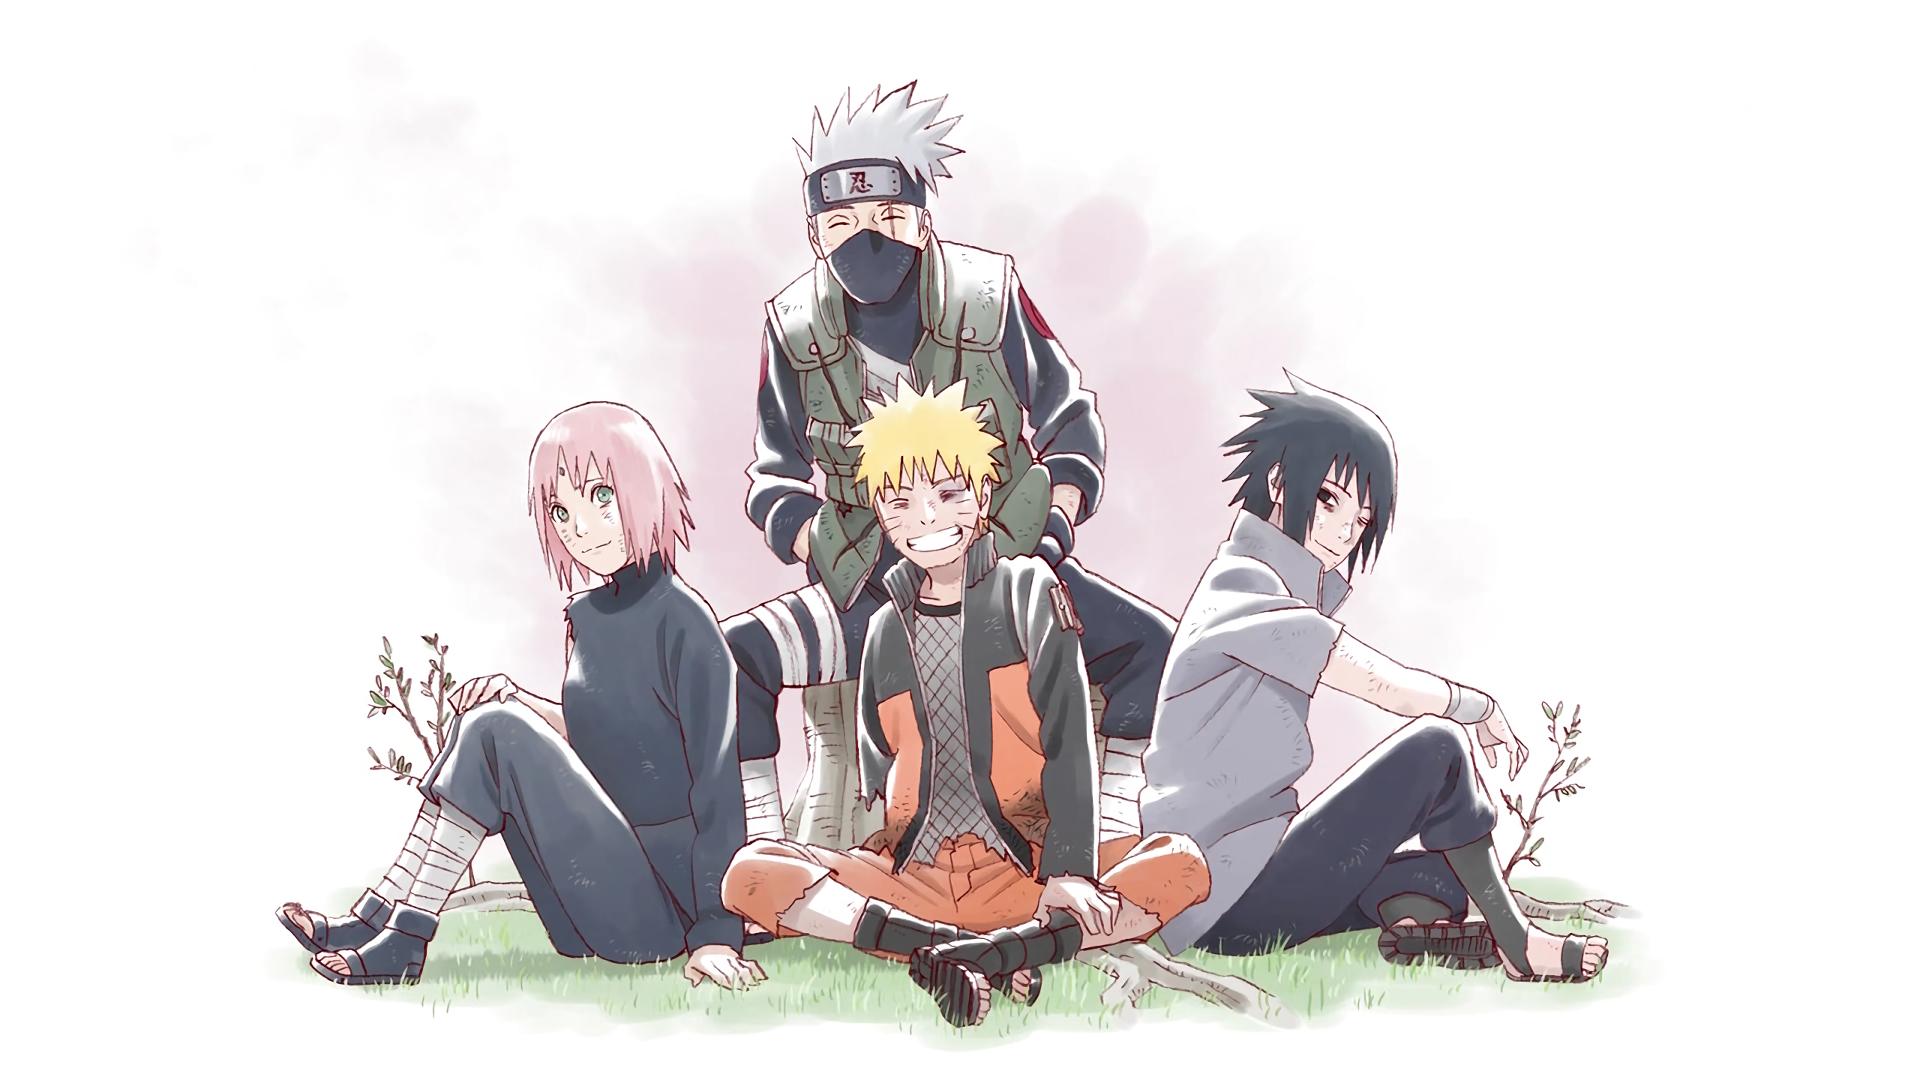 Naruto Hd Wallpaper Background Image 1920x1080 Id 789346